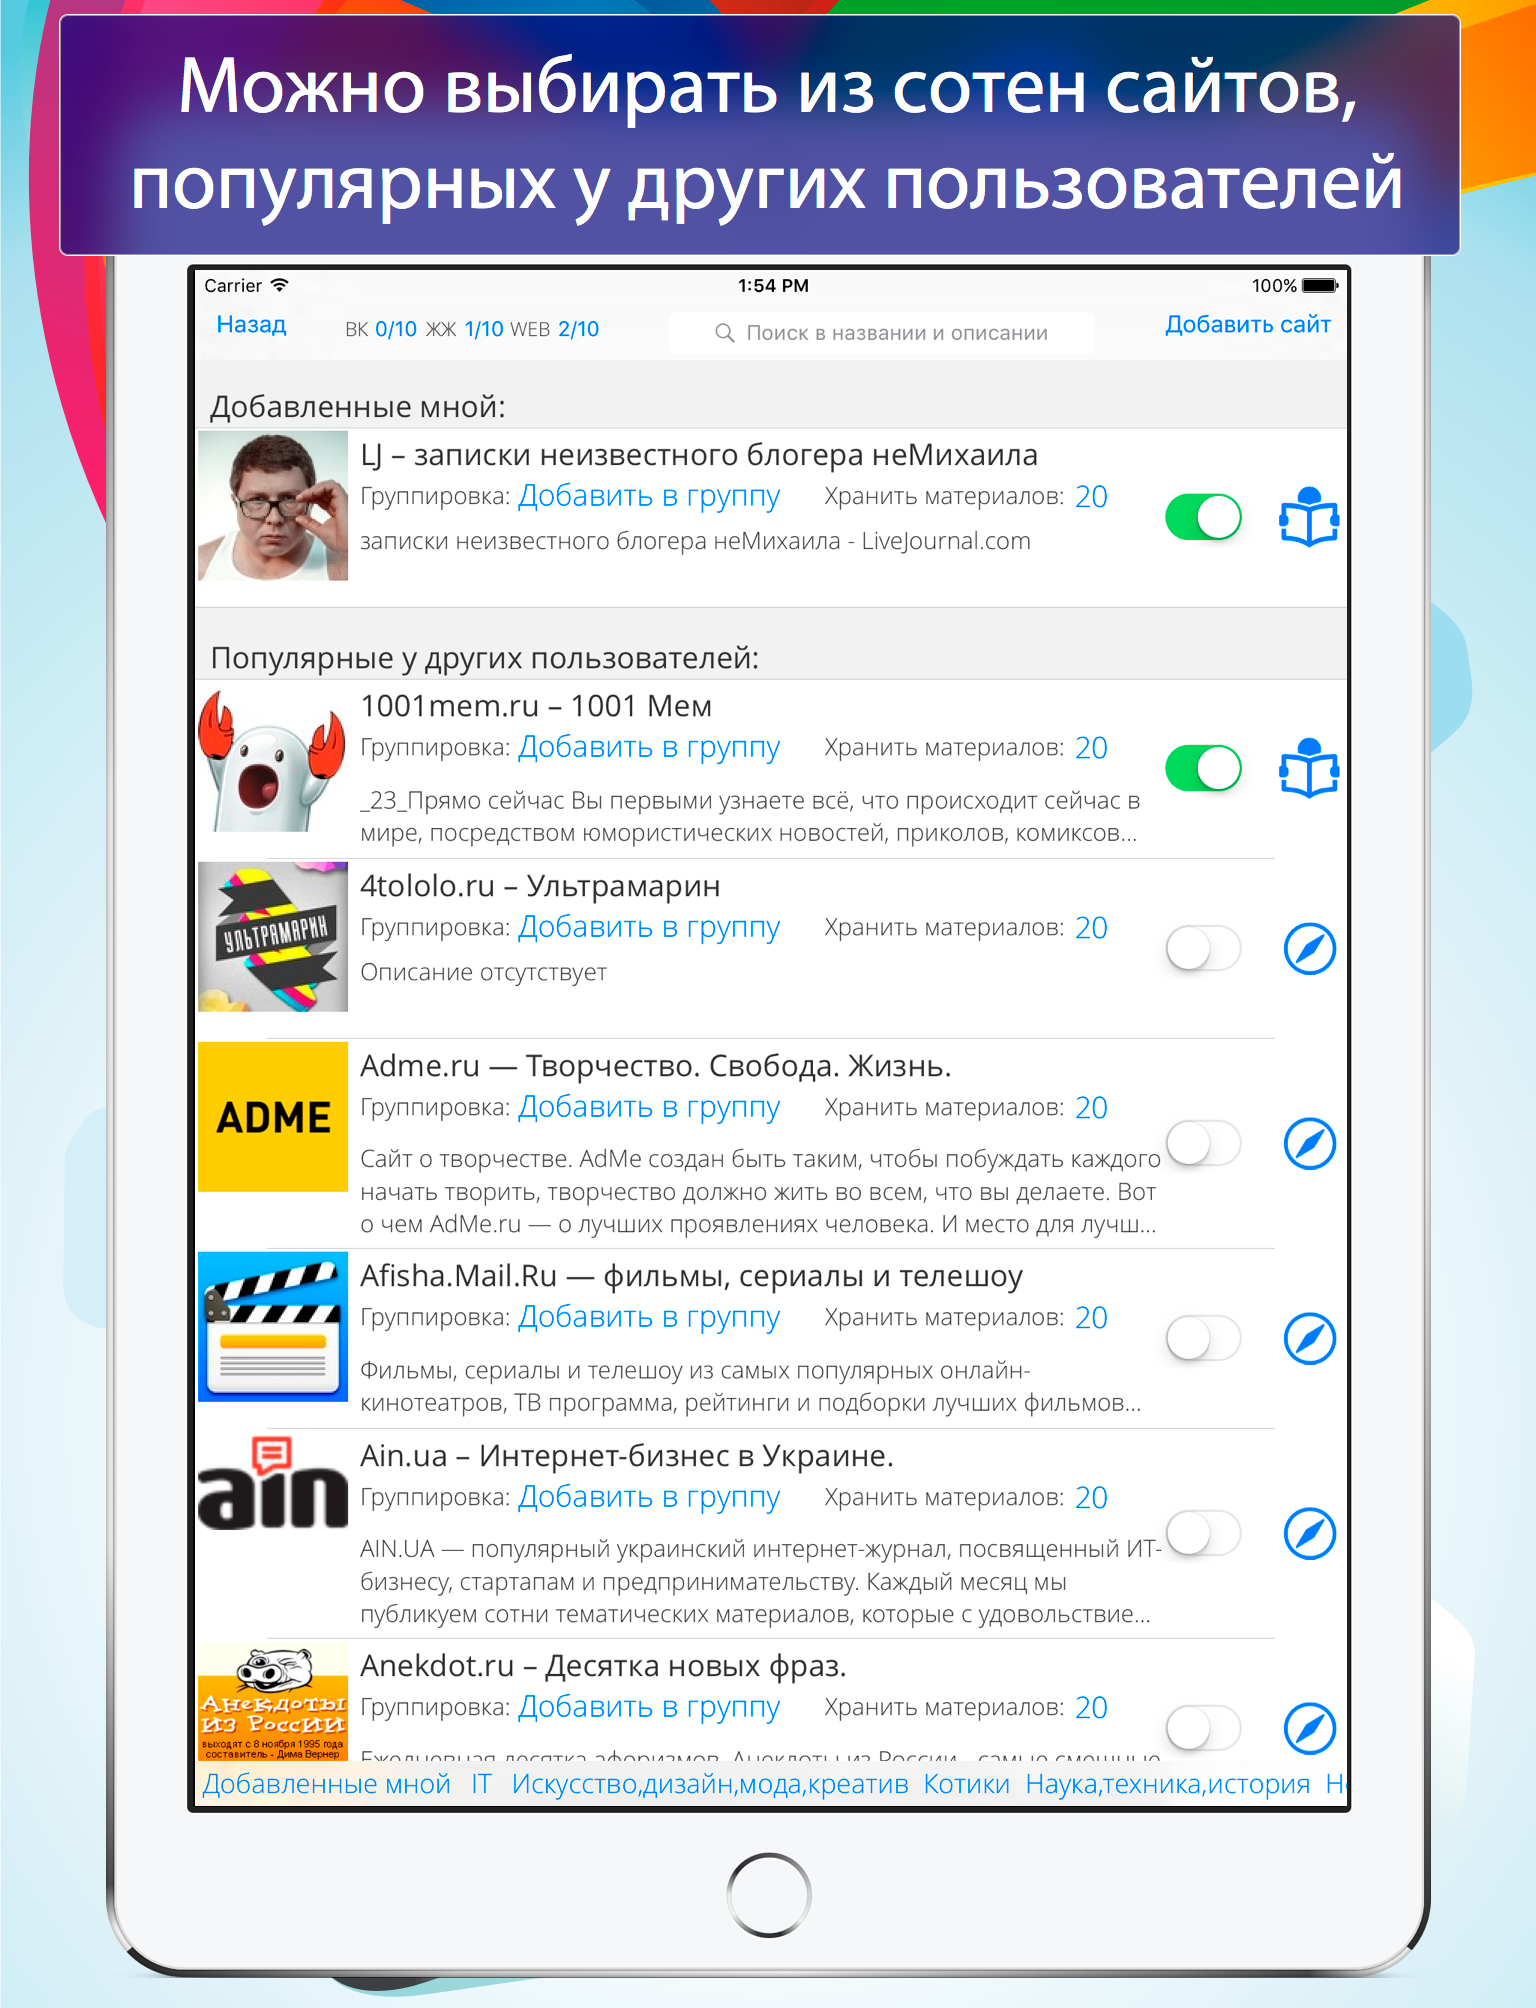 Офлайн-браузер Мегалента показал альтернативу традиционному веб√сёрфингу